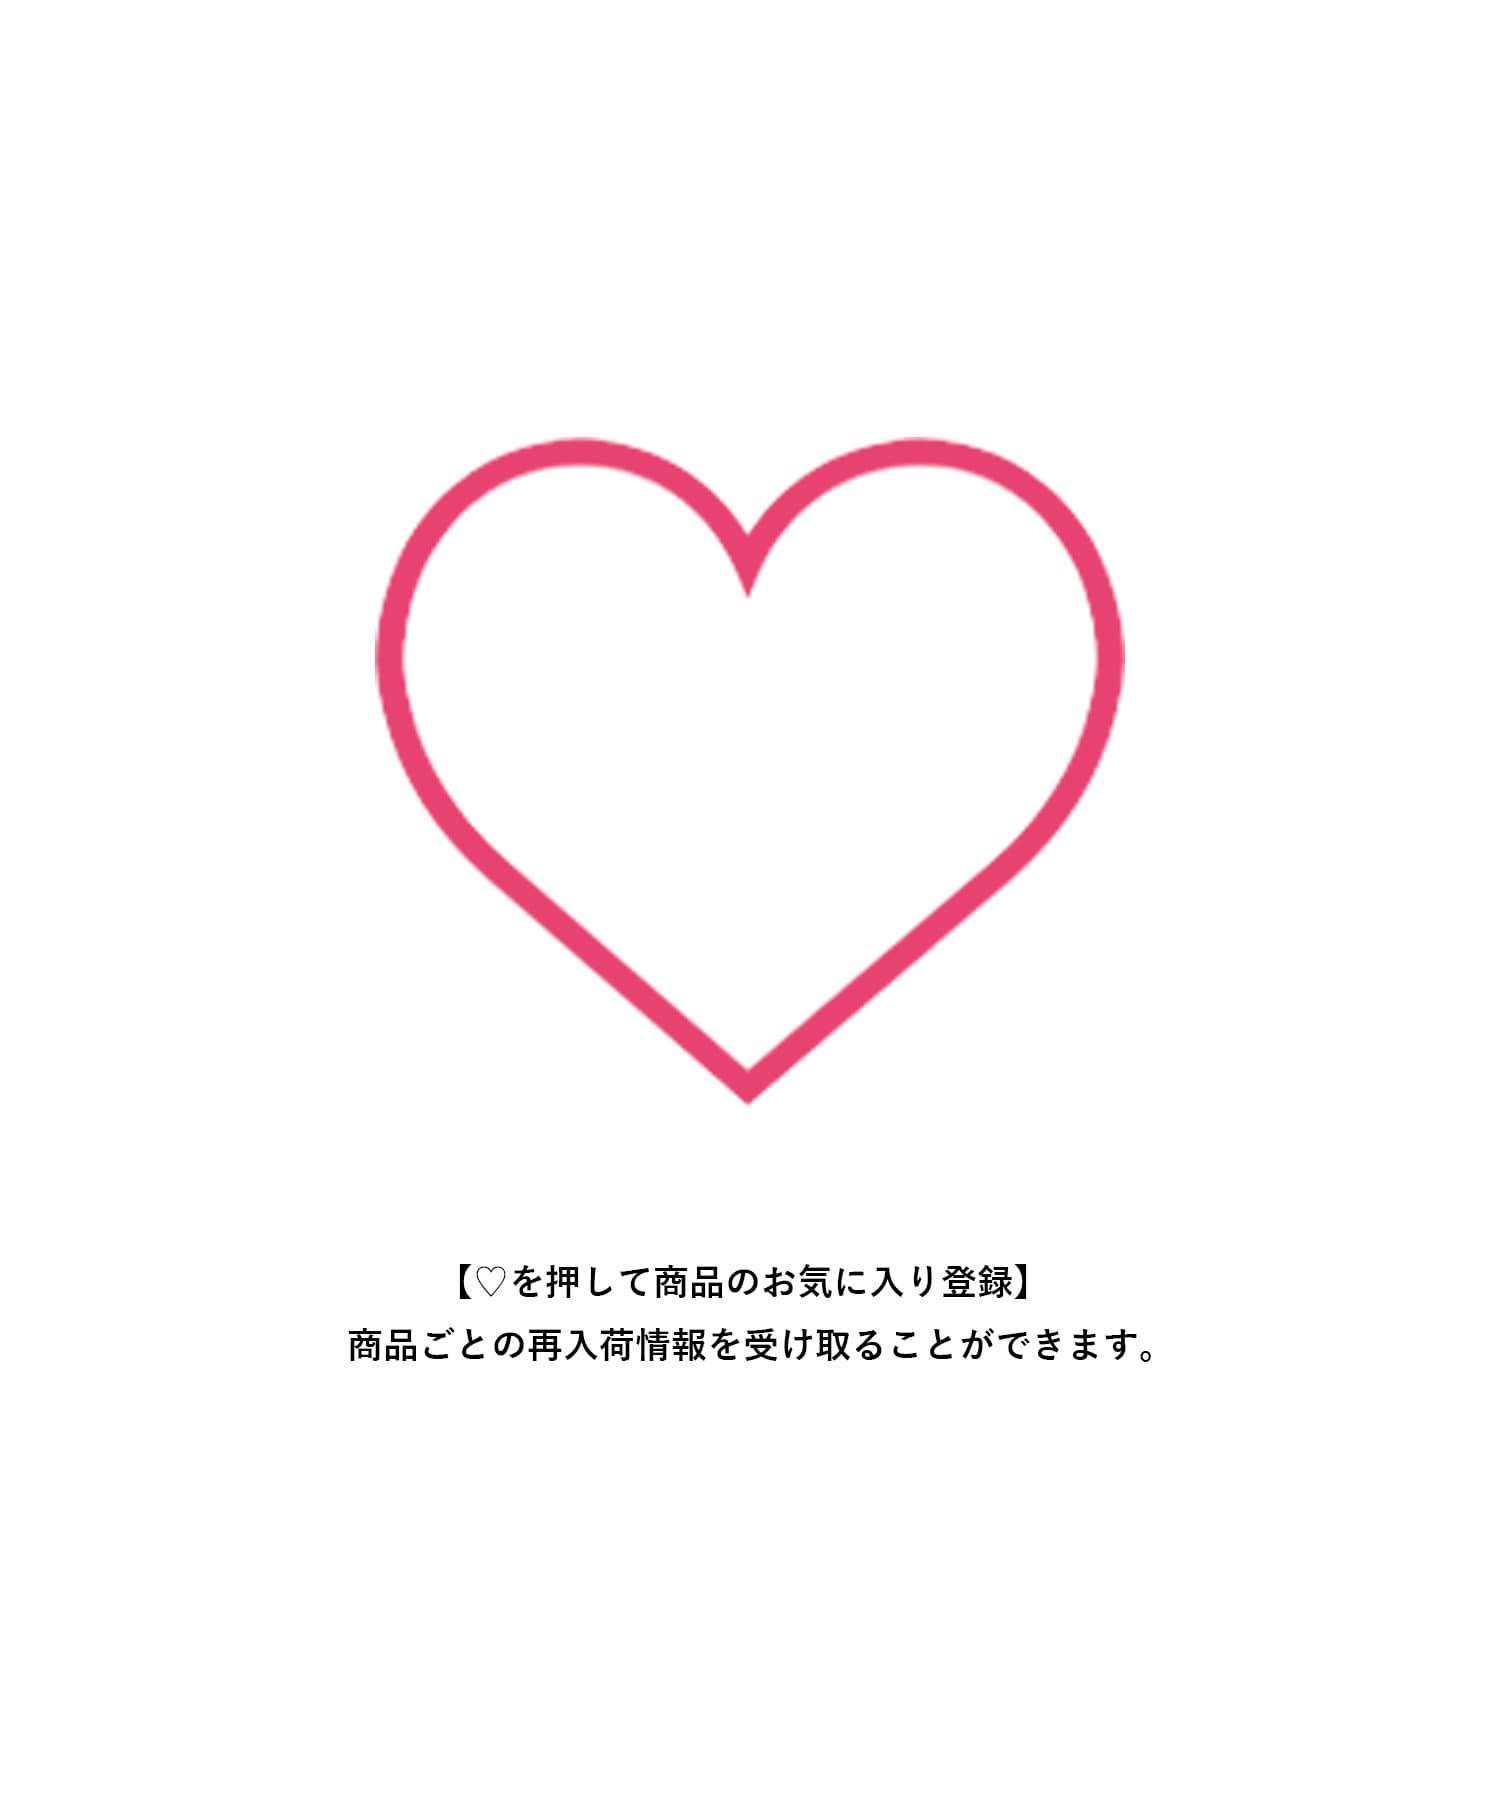 COLLAGE GALLARDAGALANTE(コラージュ ガリャルダガランテ) 【PAPILLONNER/パピヨネ】イヤカフリング